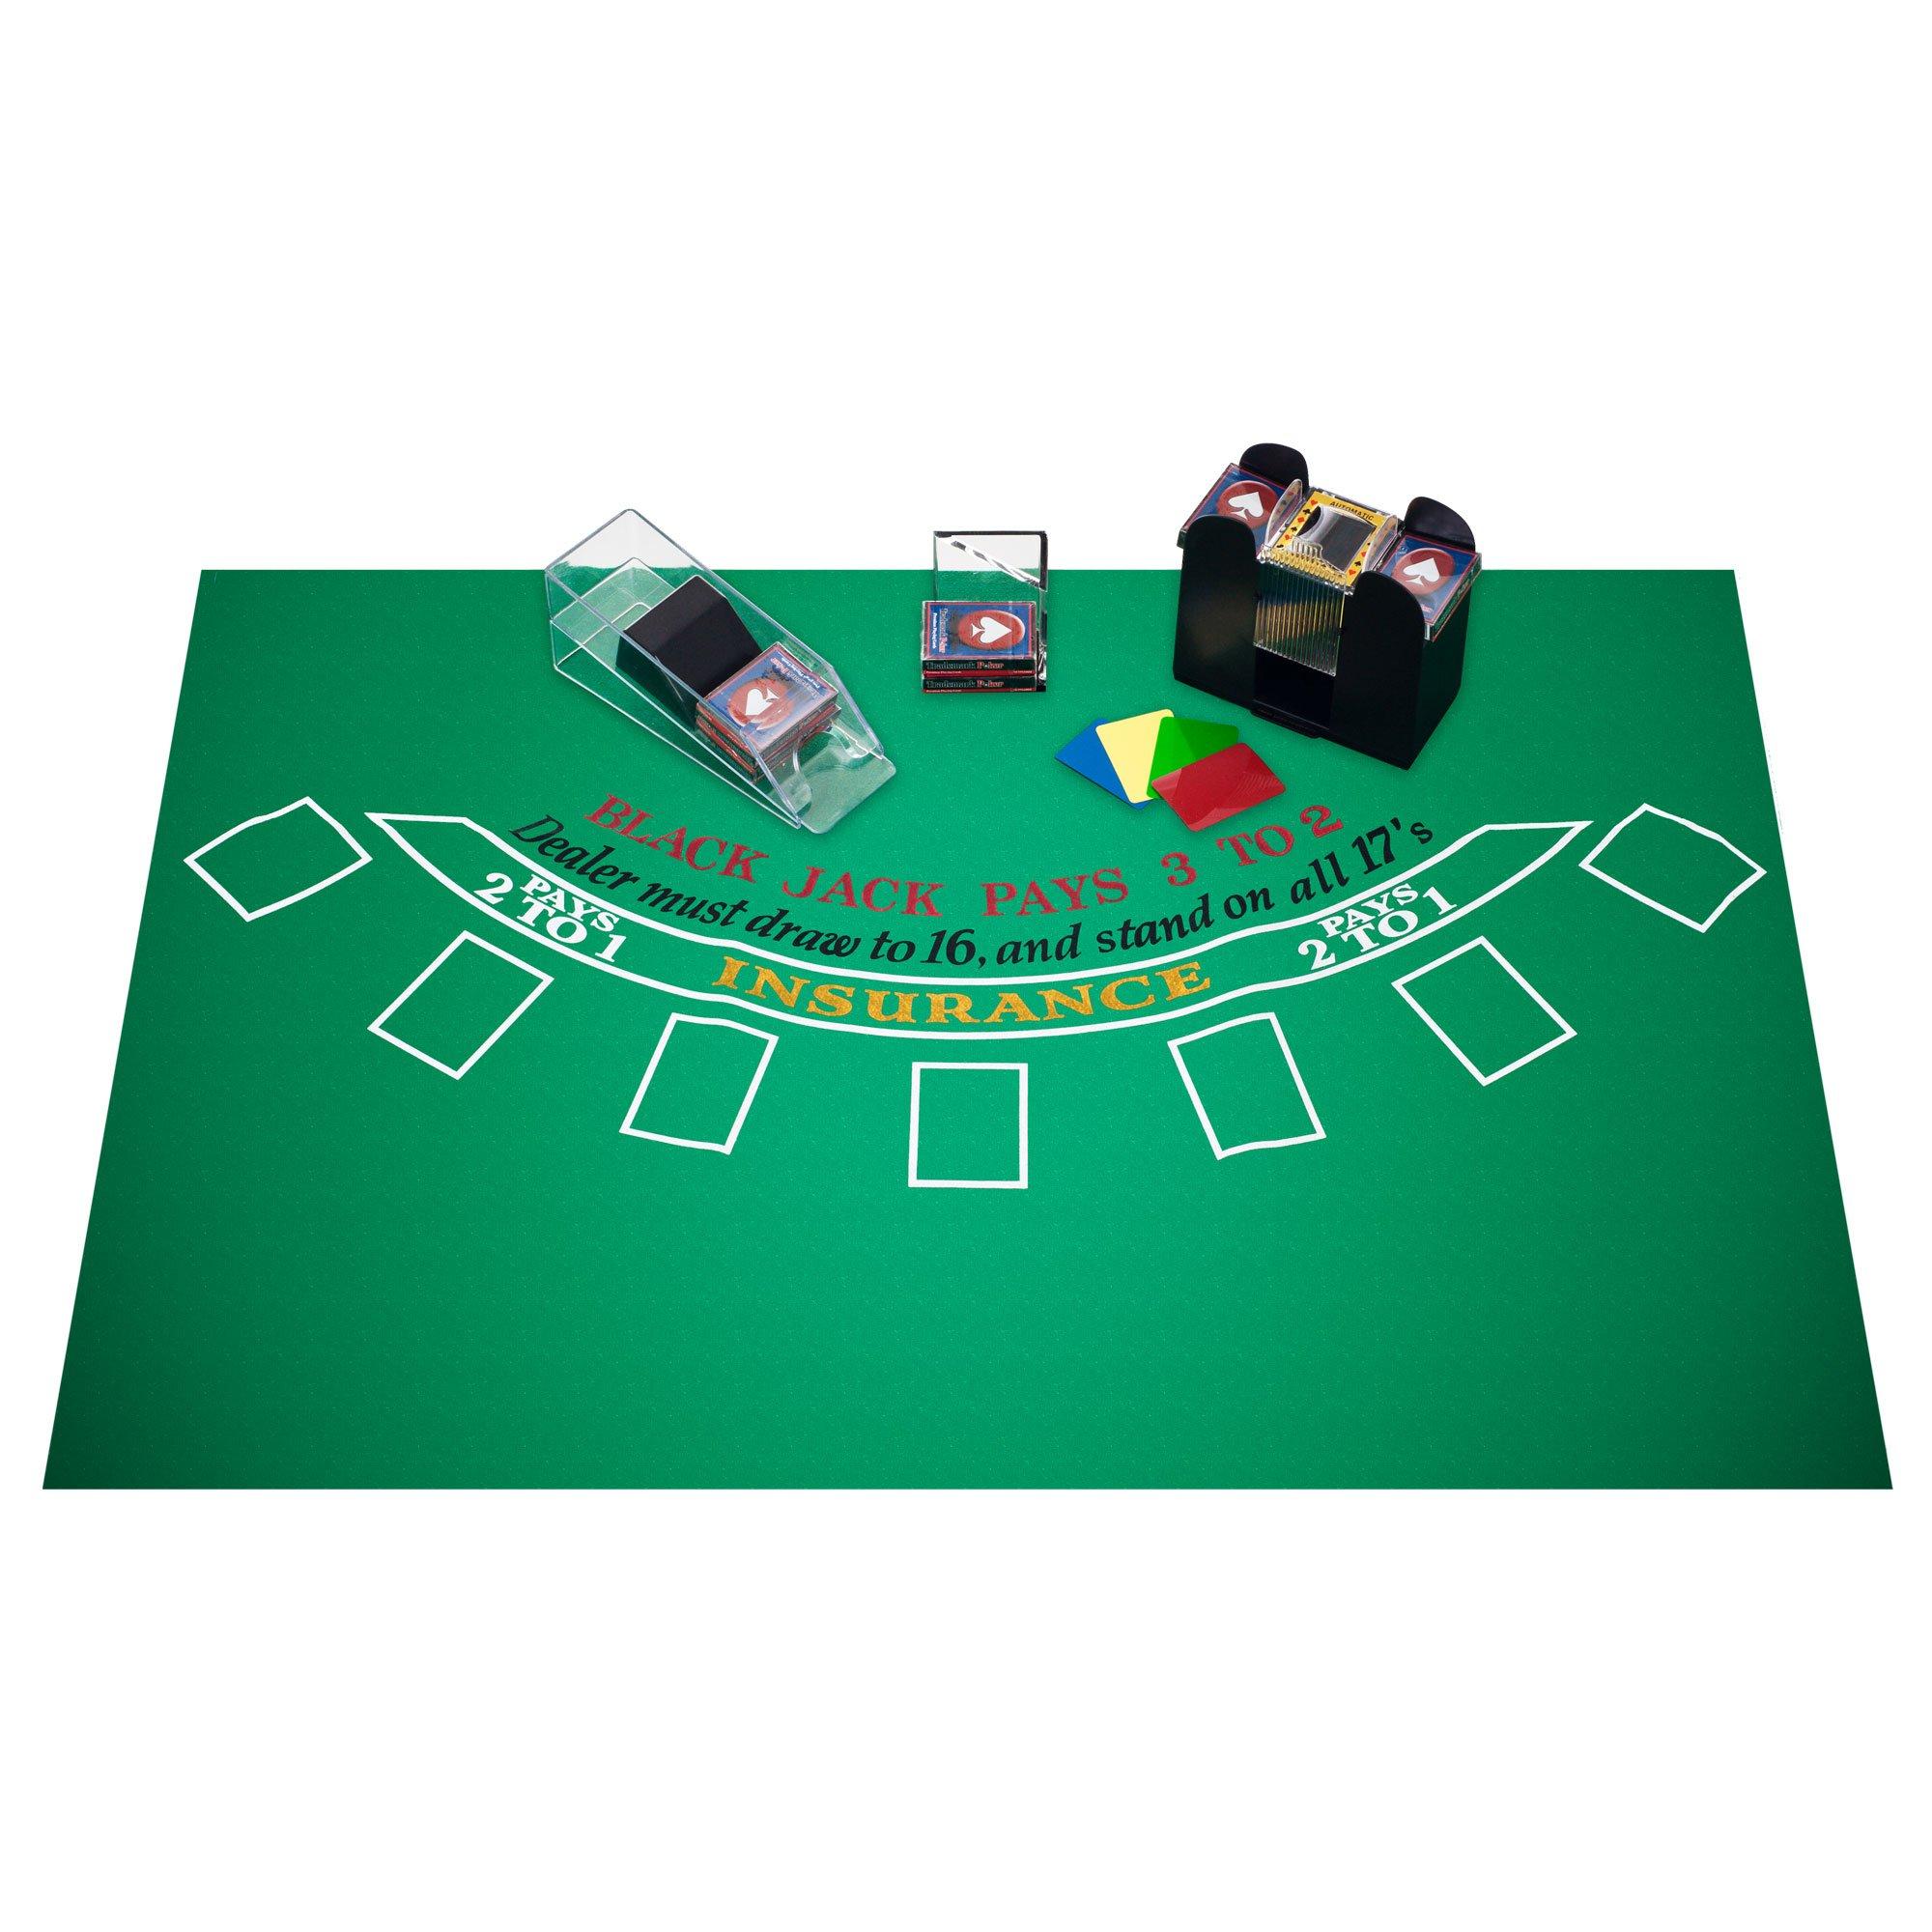 Trademark Blackjack Accessories Set (Multi)